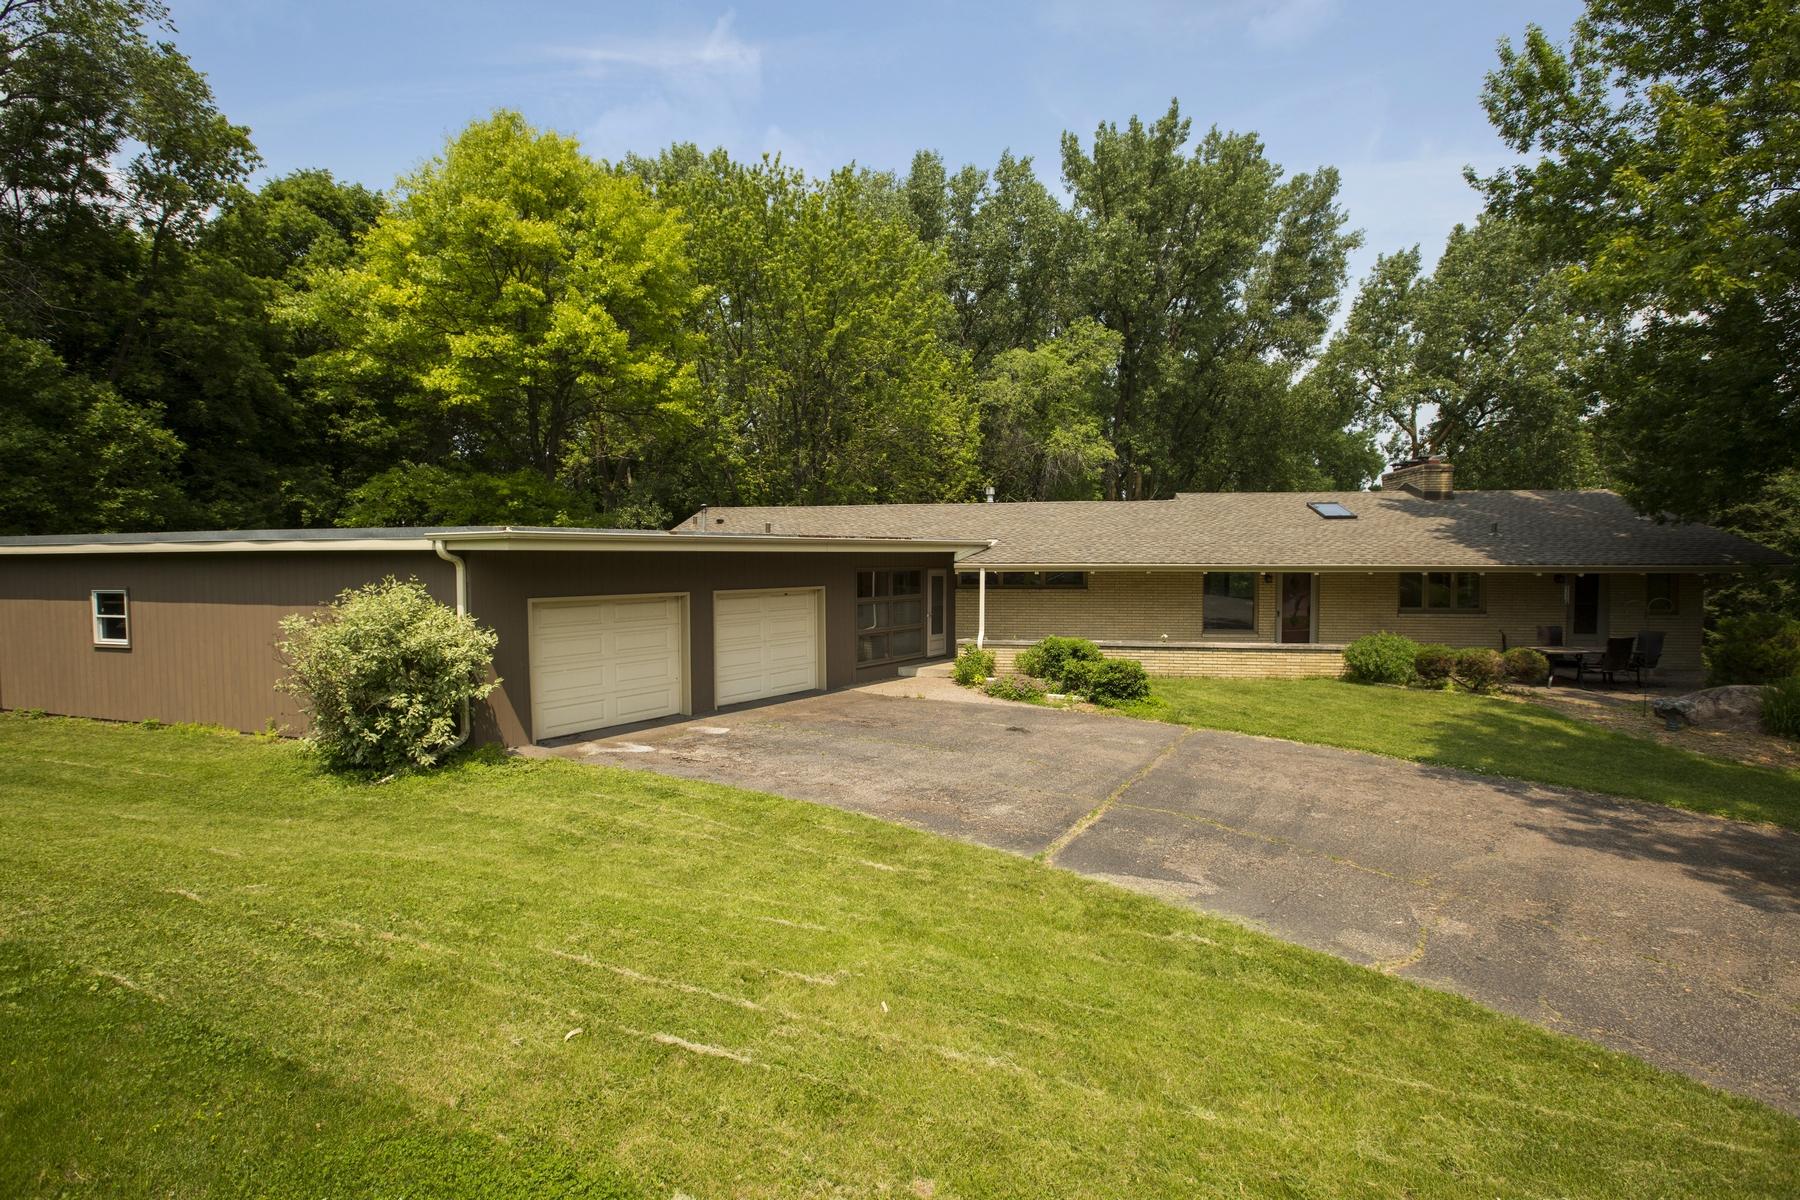 Land for Sale at 4900 Prescott Circle Edina, Minnesota 55436 United States